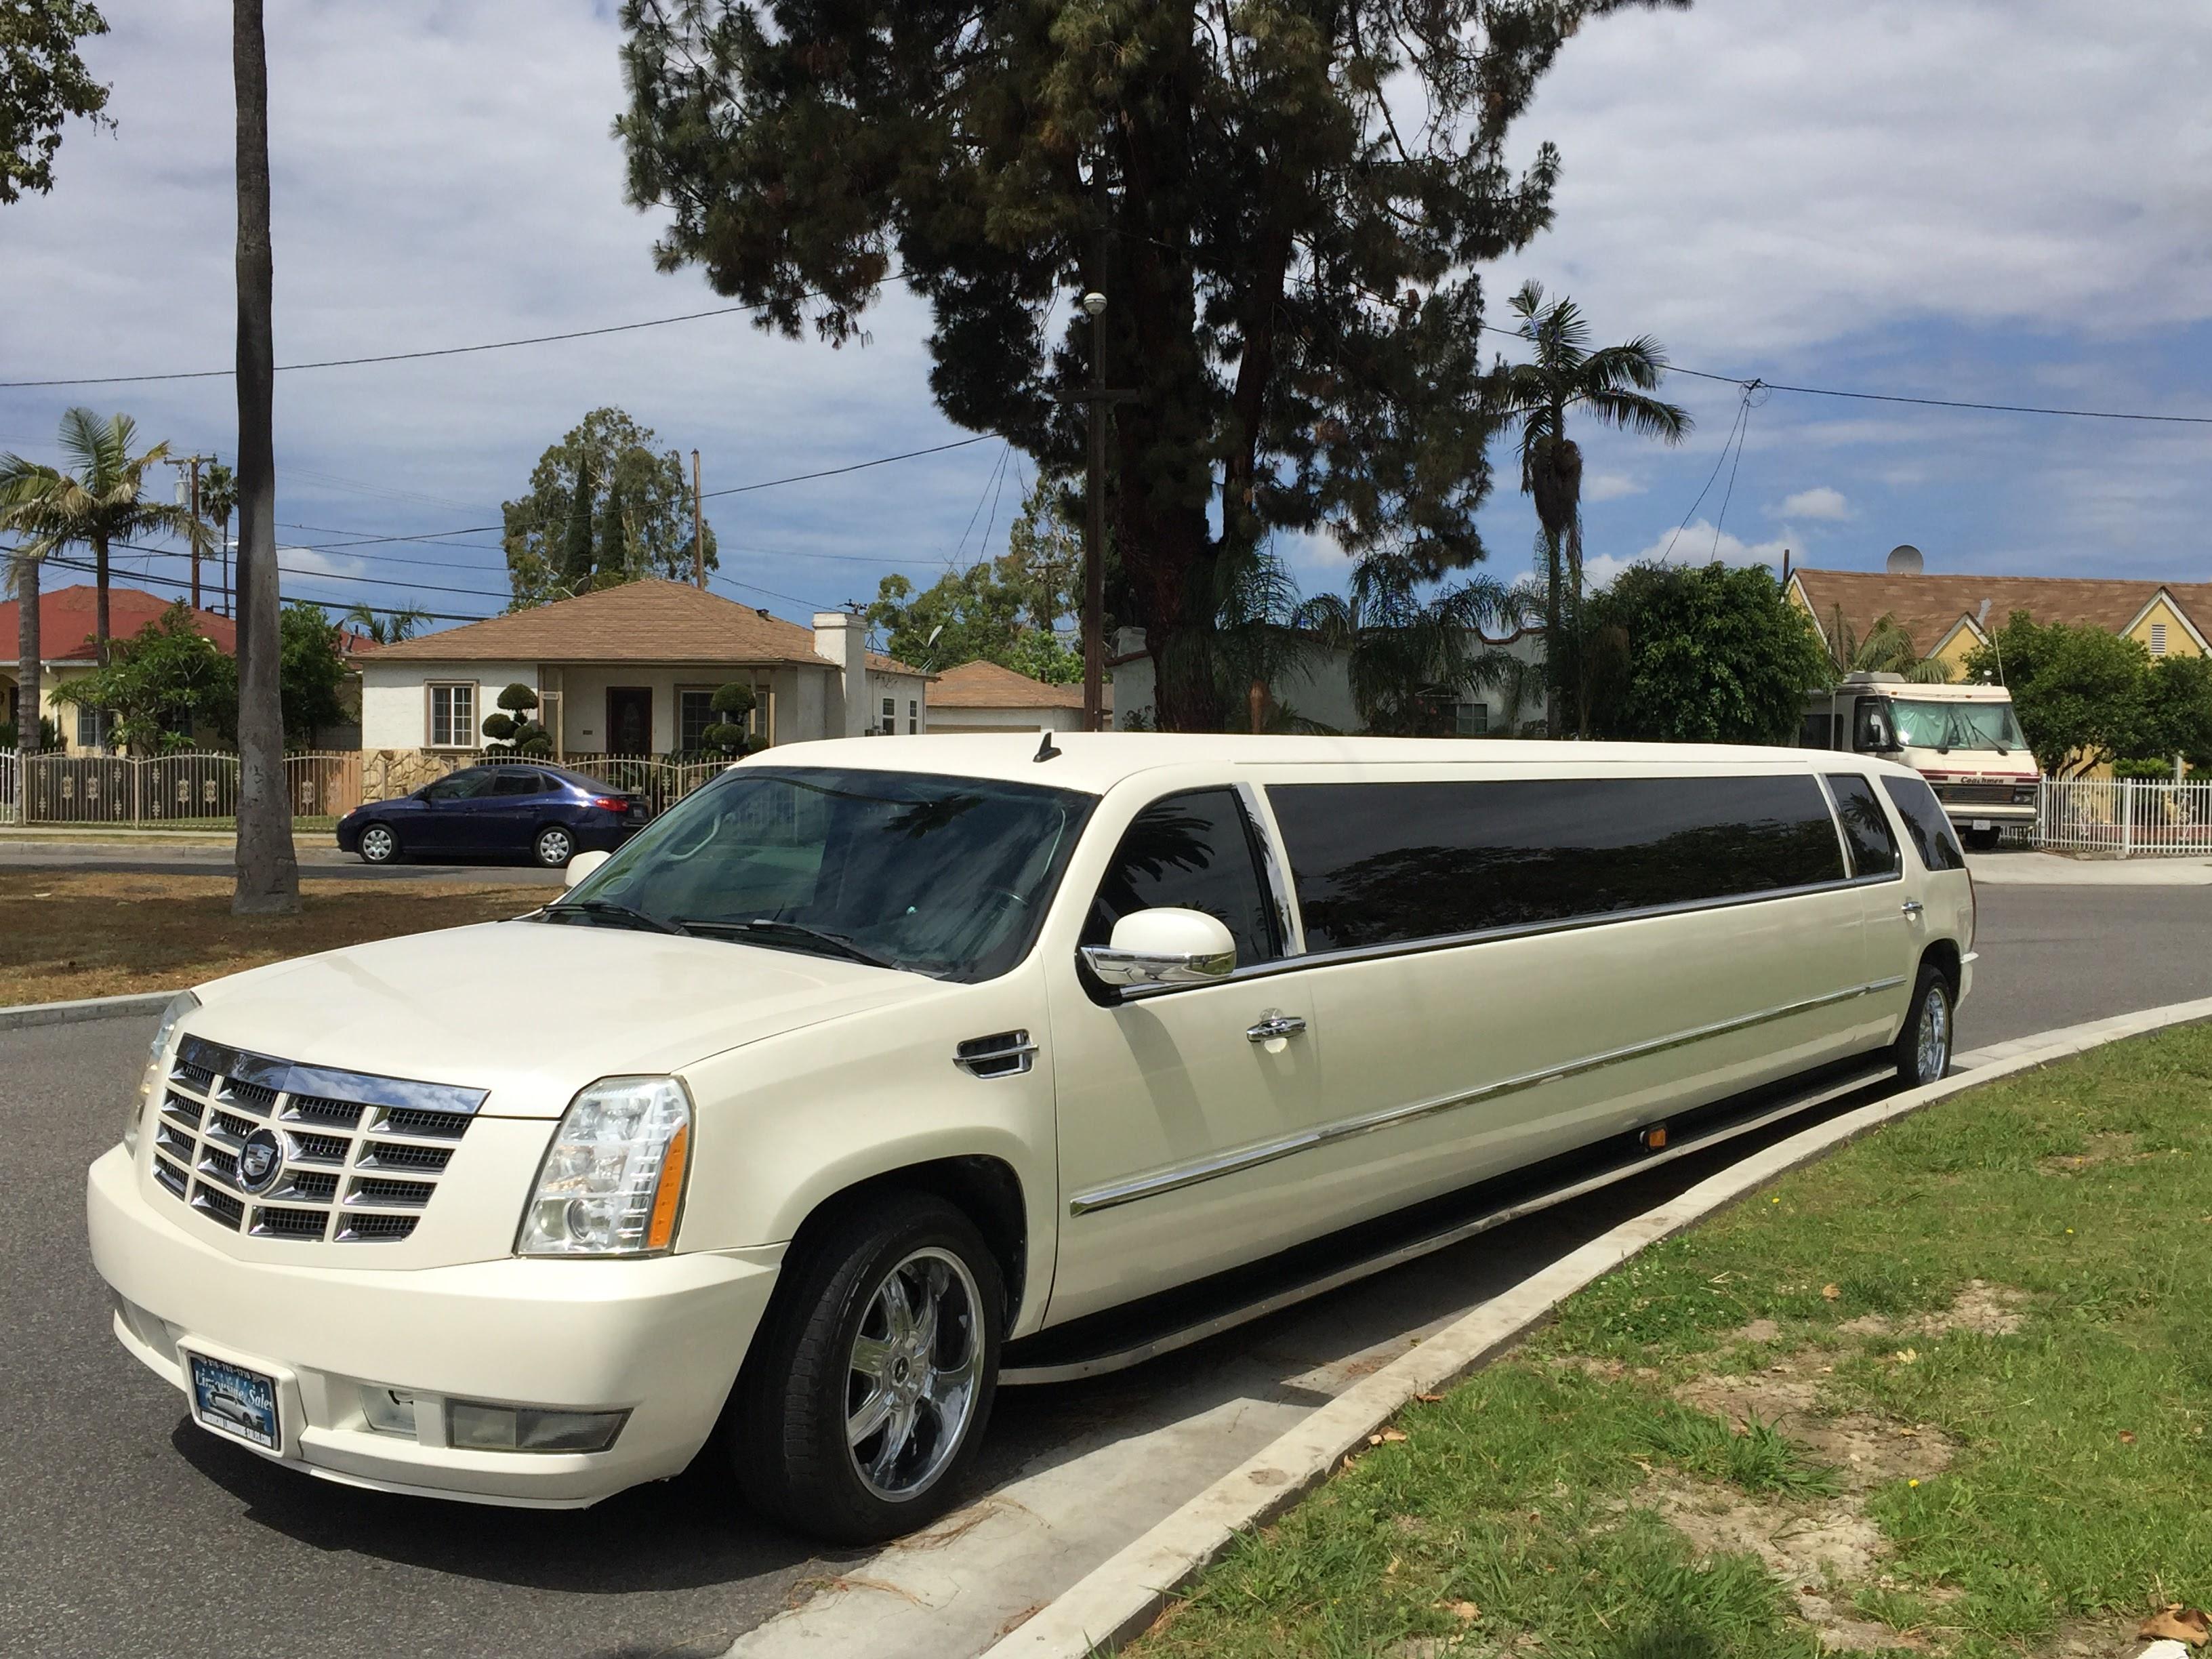 2007 Diamond White 20 Passenger Cadillac Limo For Sale